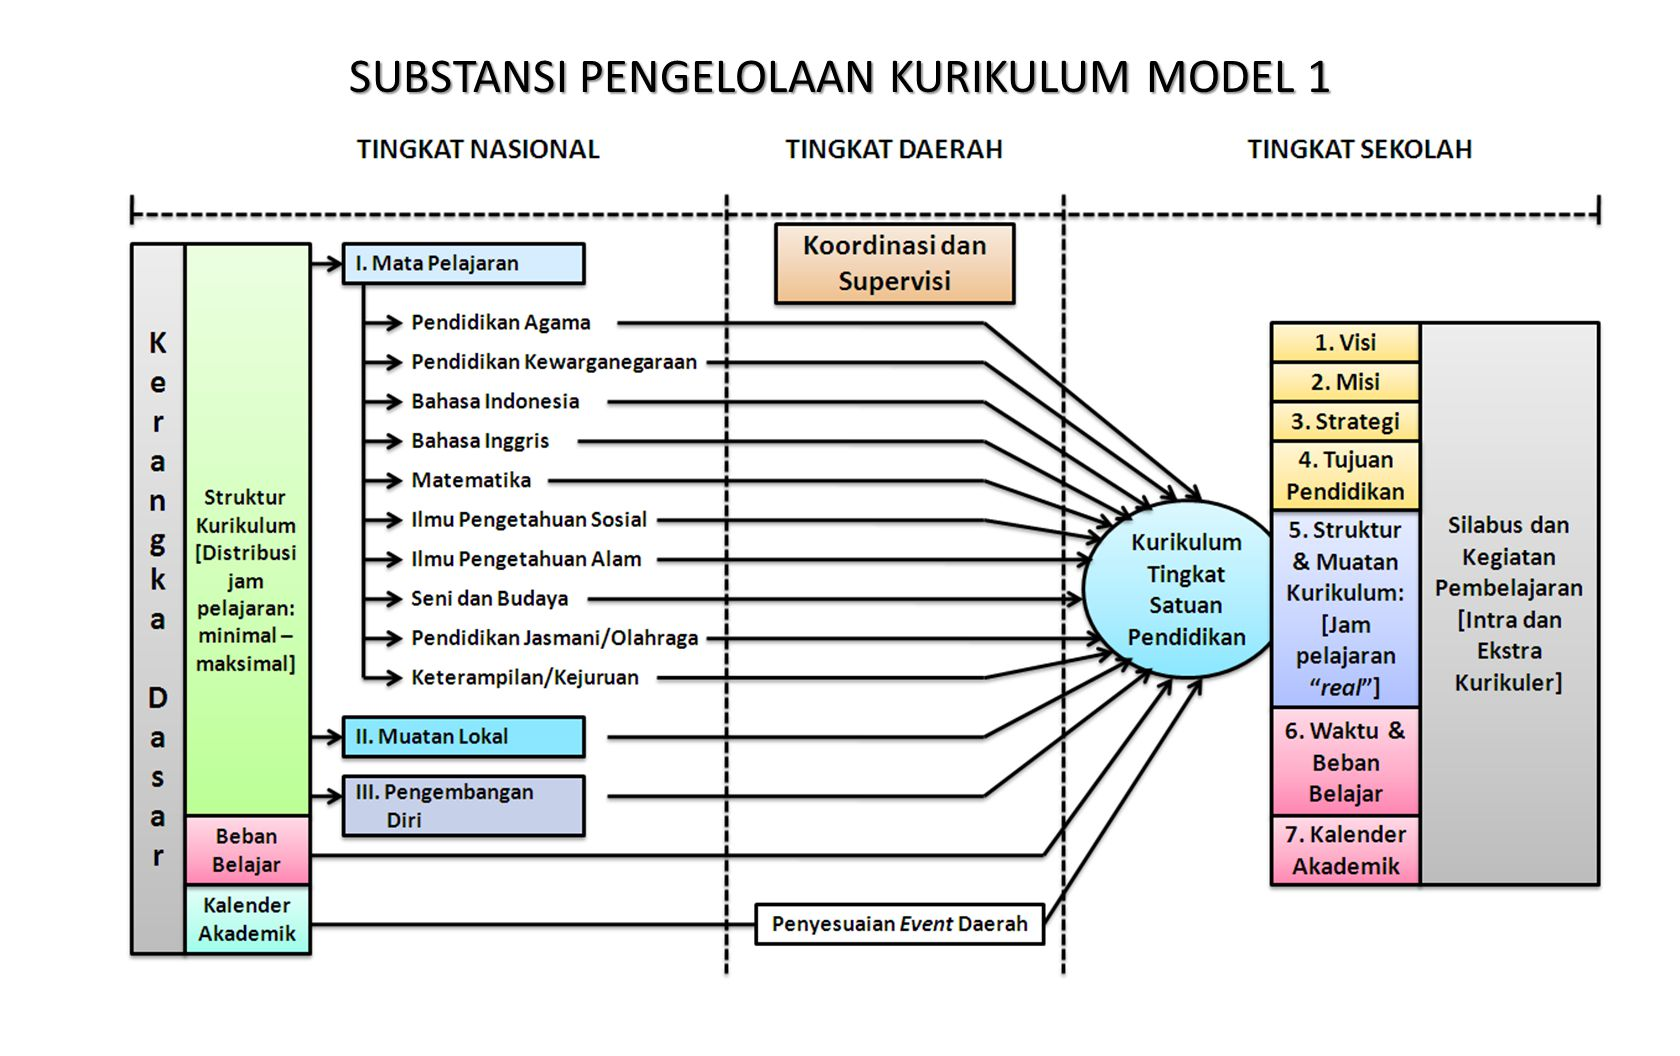 SUBSTANSI PENGELOLAAN KURIKULUM MODEL 1